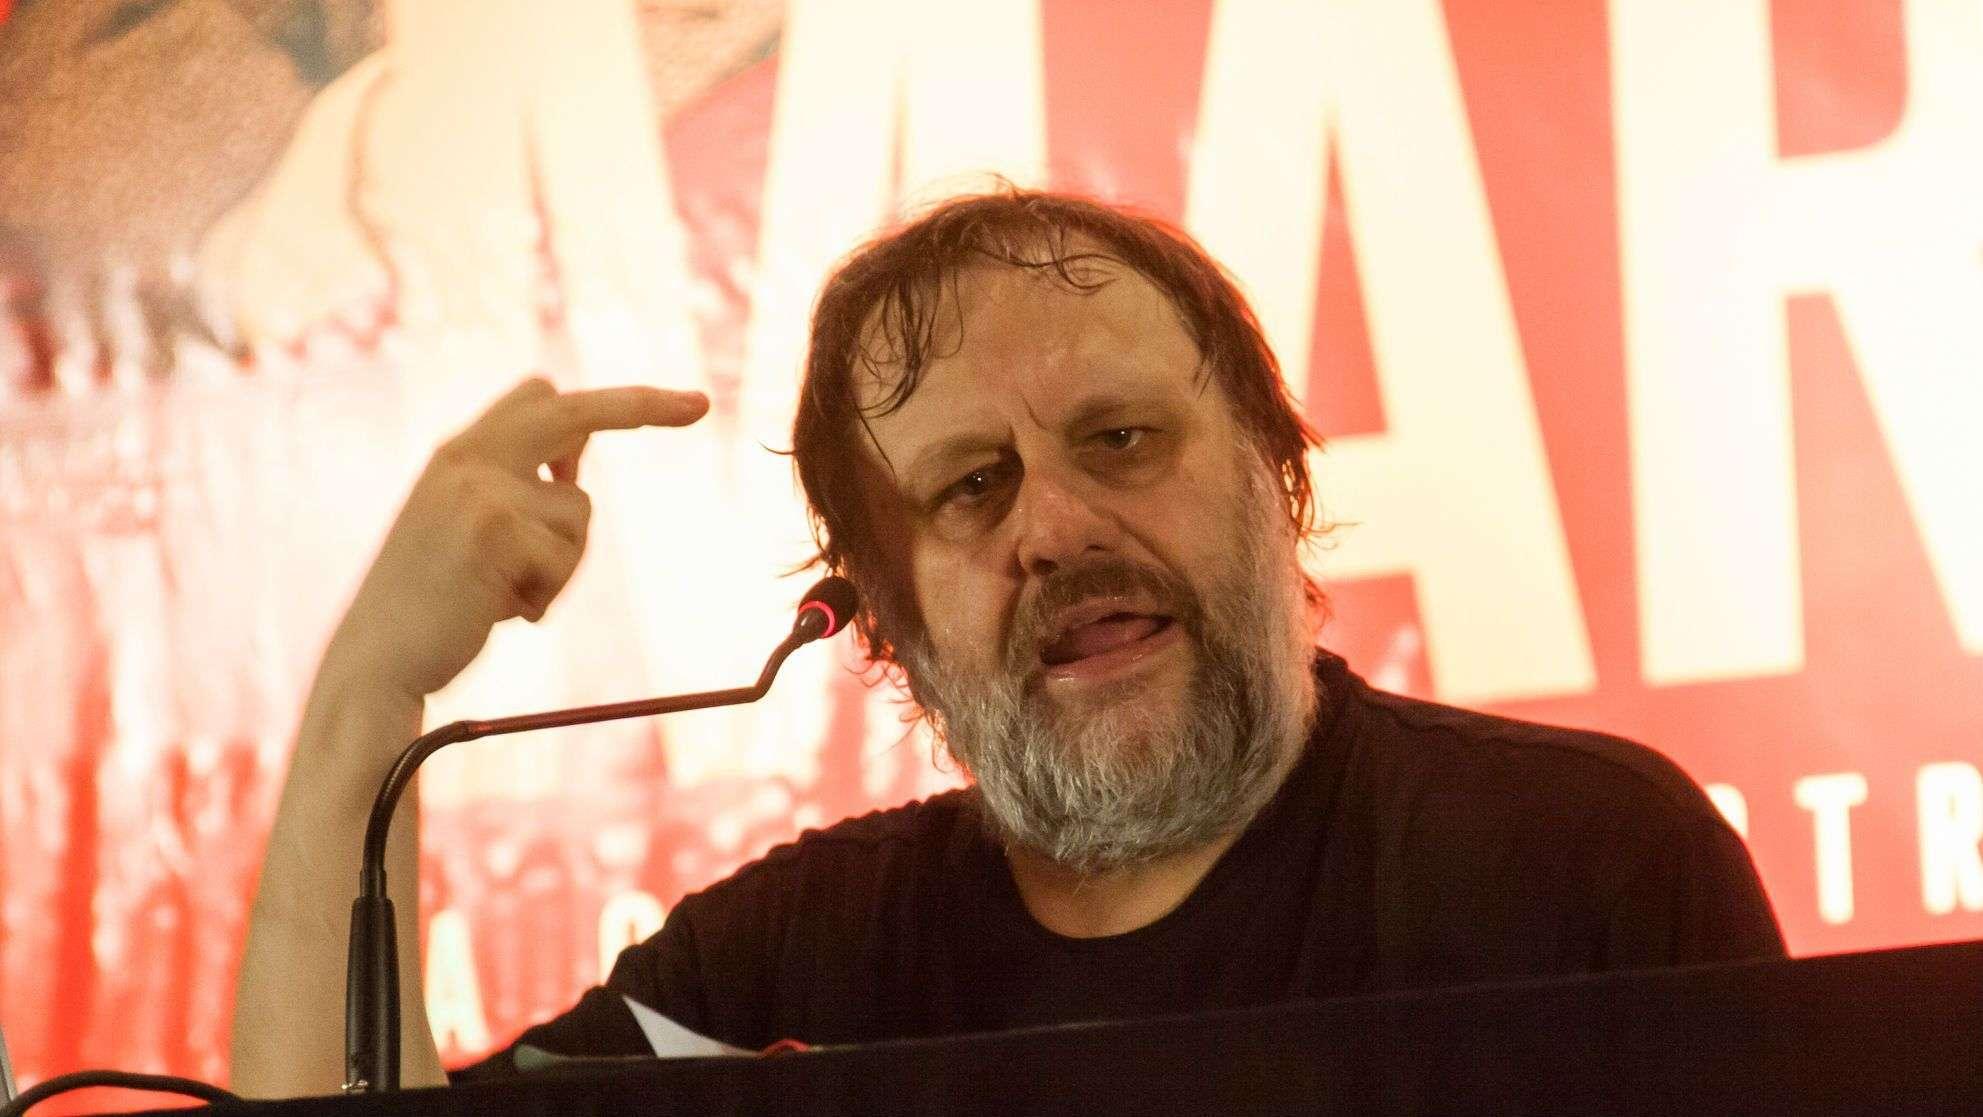 Slavoj Zizek – Είναι, πράγματι, οι χειρότεροι γεμάτοι παθιασμένη ένταση;